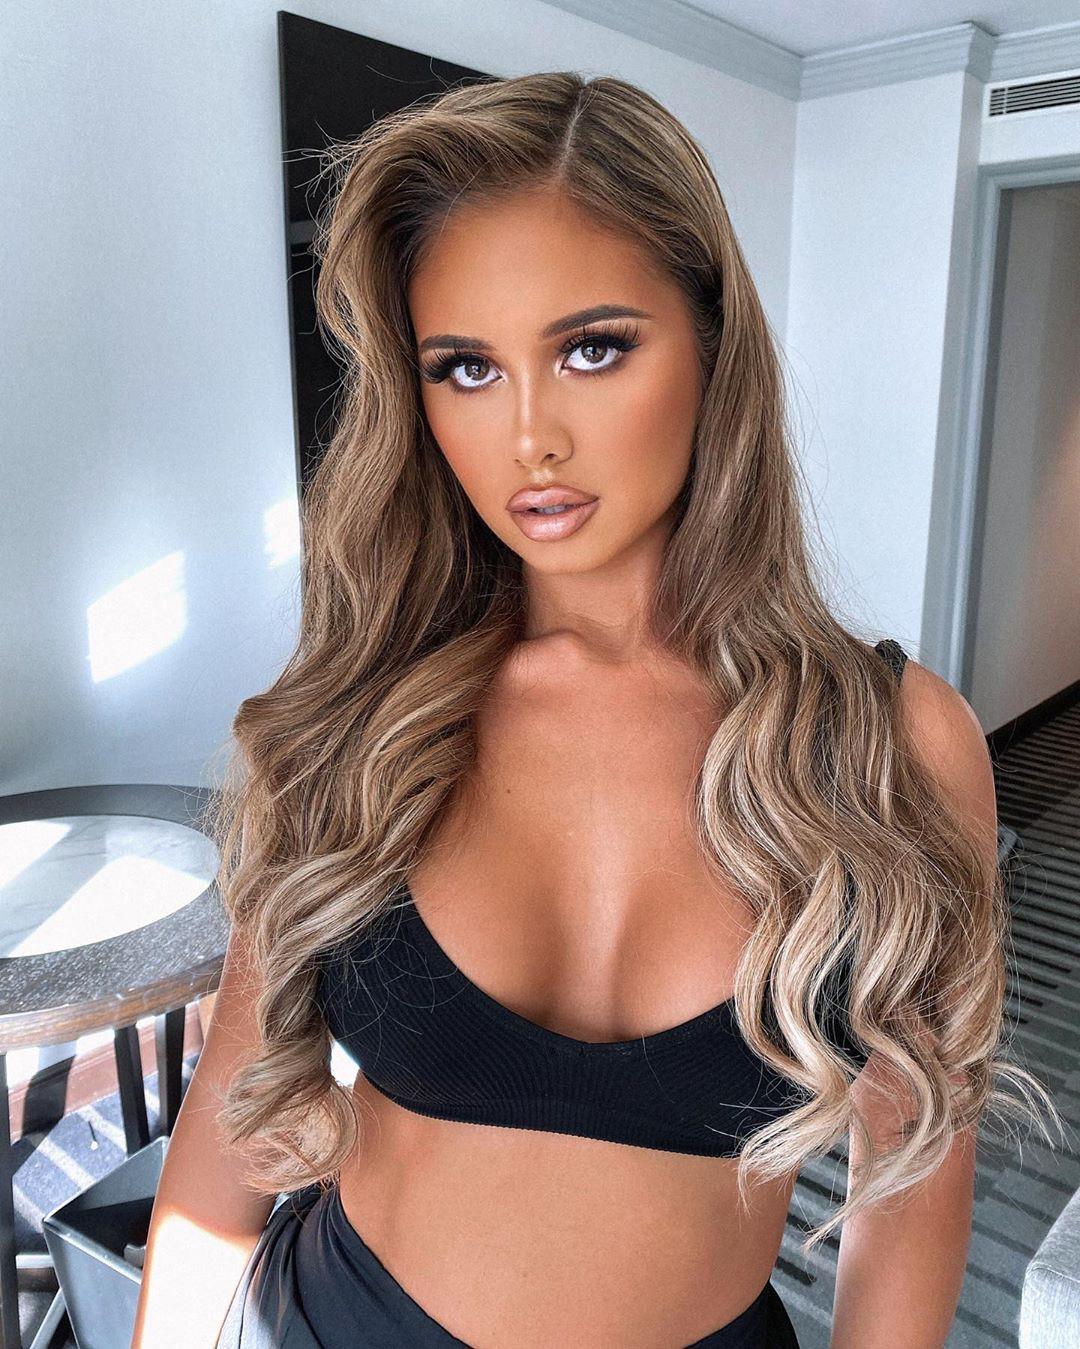 Tarsha Olarte cute blond hairs, Woman Long Hair Style, Hottest Model In World